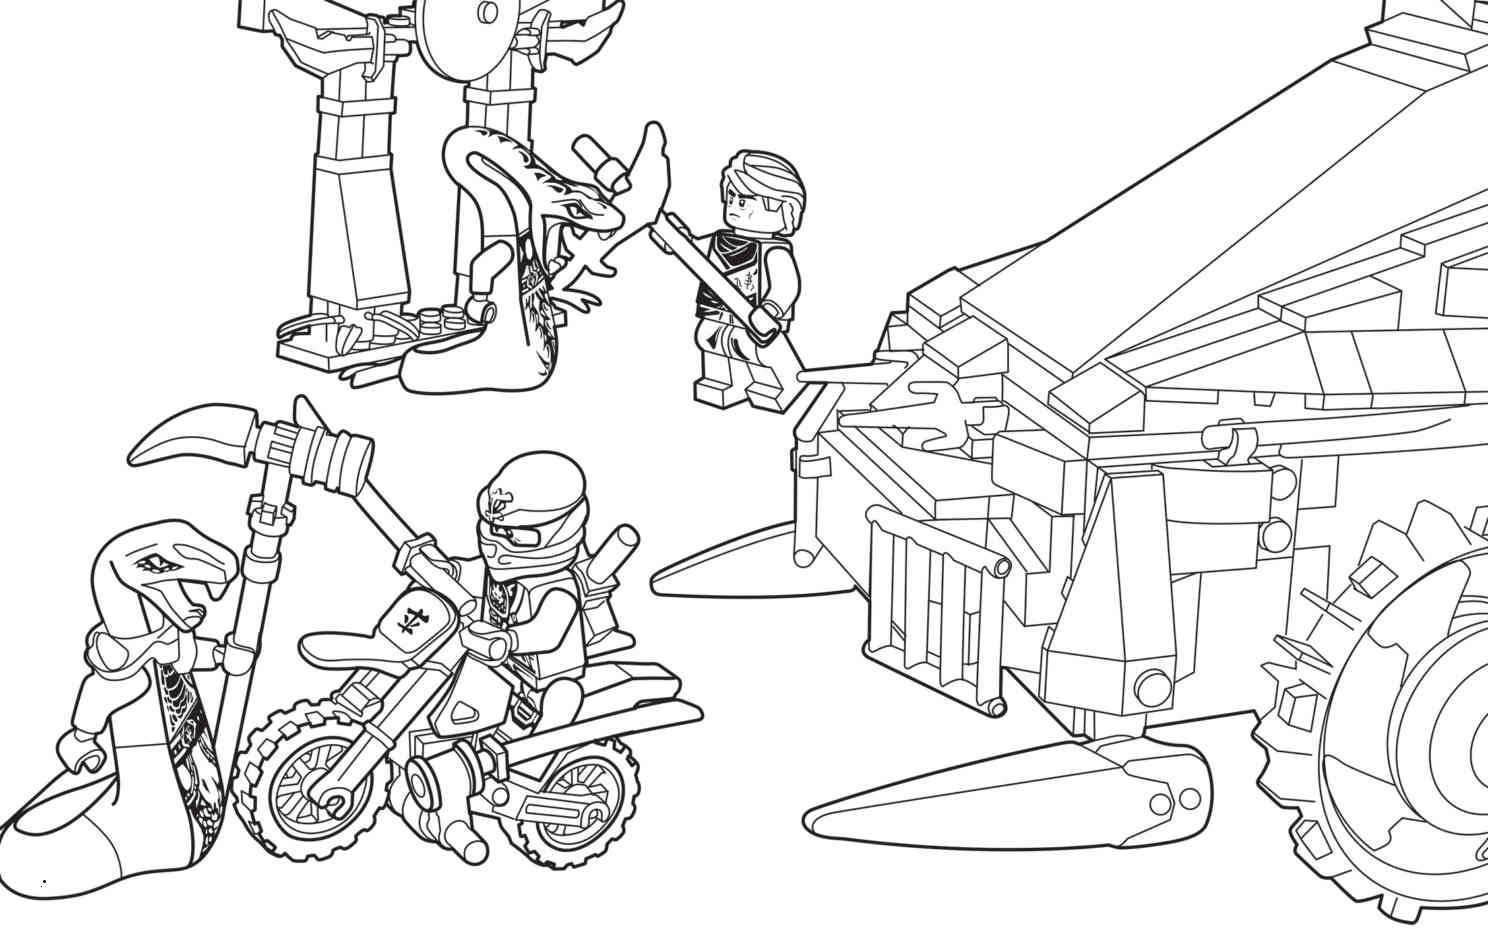 Lego Ninjago Malvorlagen Neu Ninjago Ausmalbilder Lloyd 2015 Einzigartig Lego Ninjago Chen Das Bild